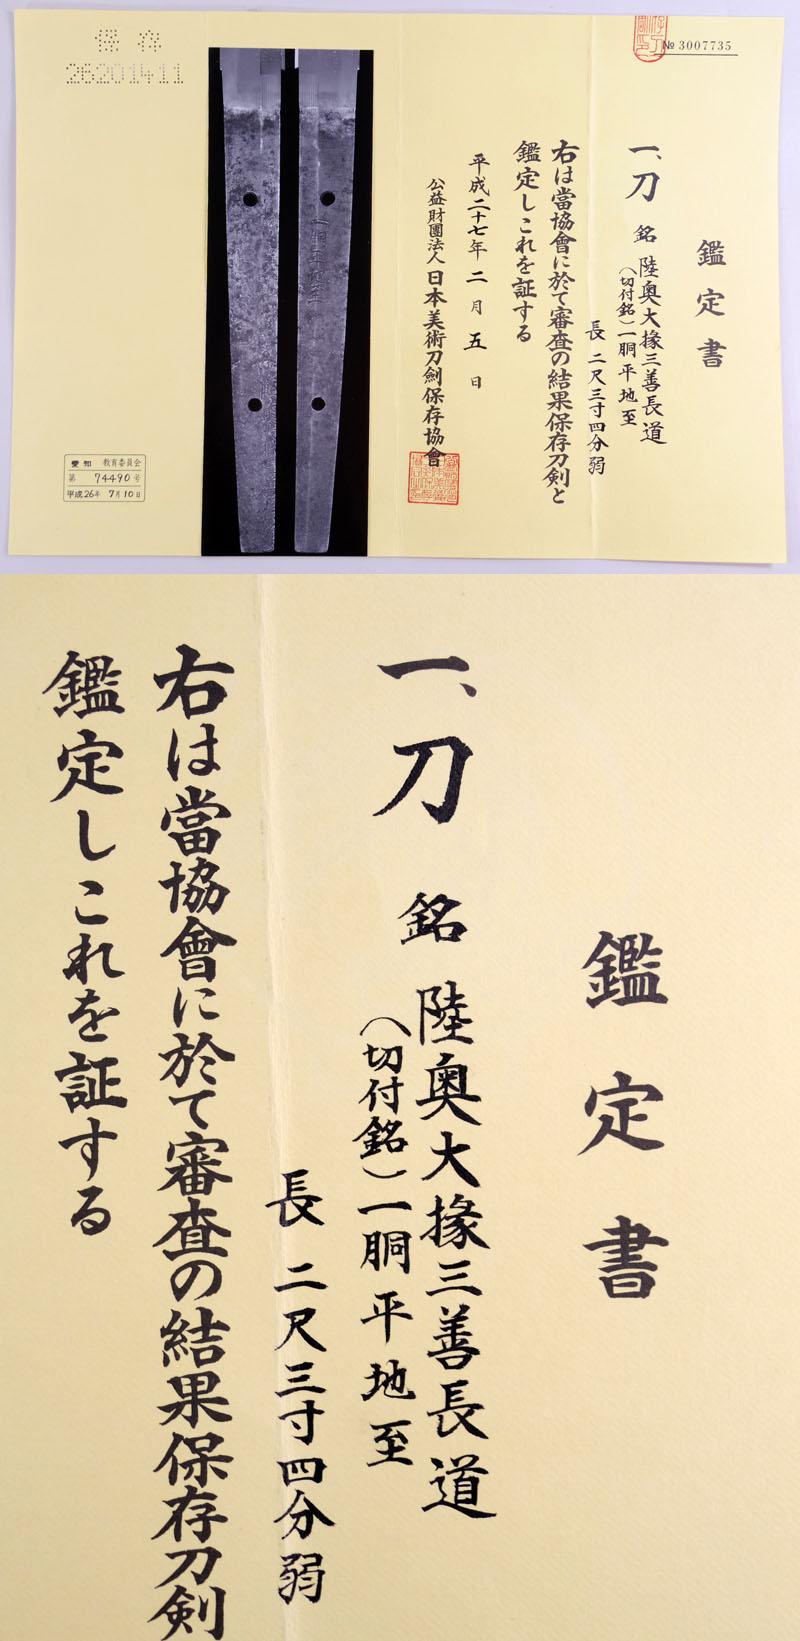 陸奥大掾3善長道 Picture of Certificate